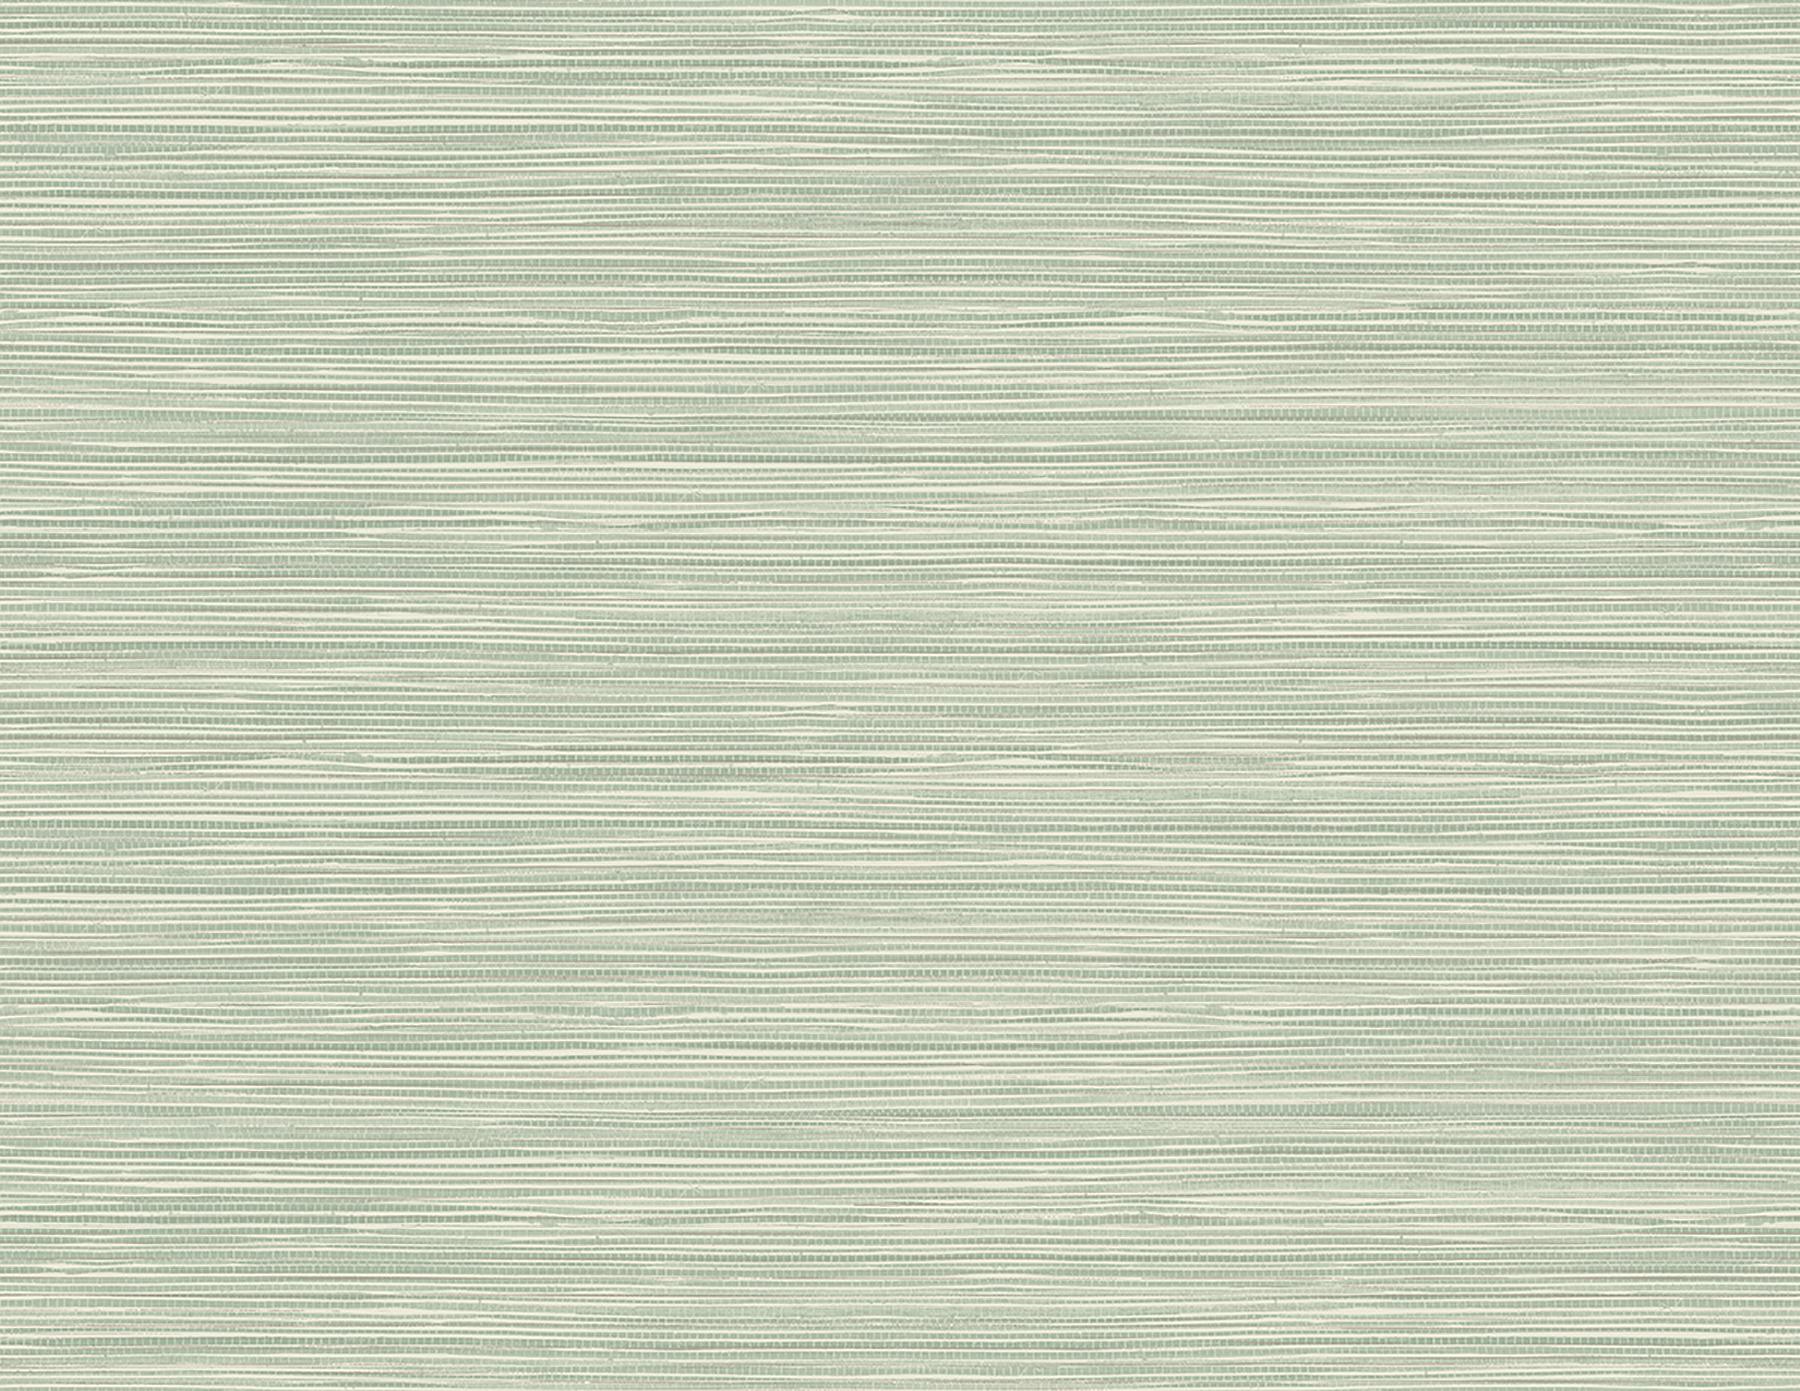 Picture of Bondi Seafoam Grasscloth Texture Wallpaper